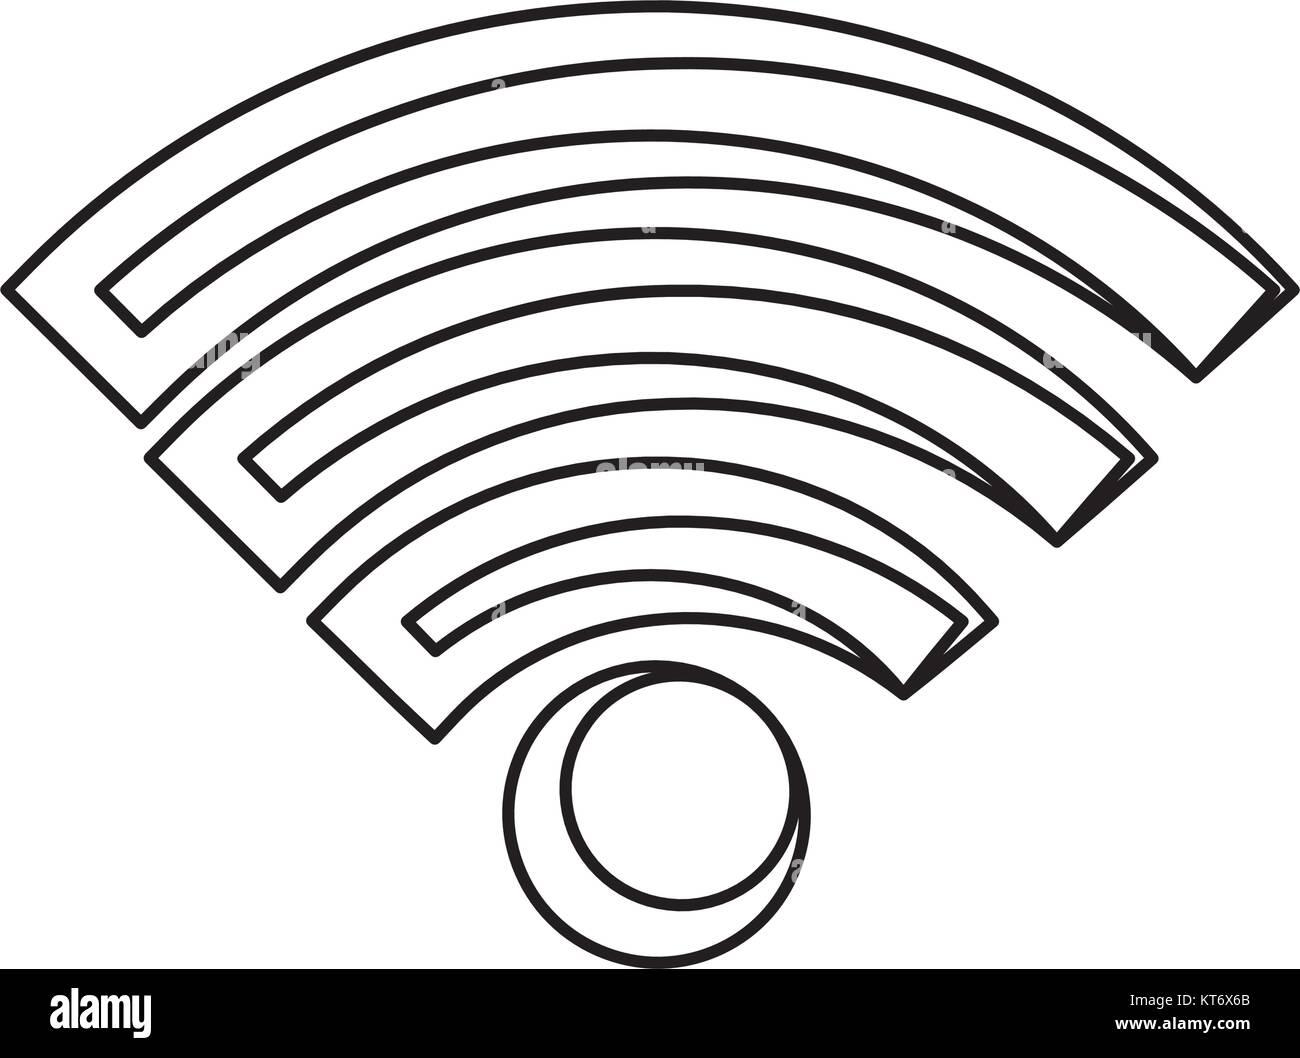 Wifi zone symbol stock image